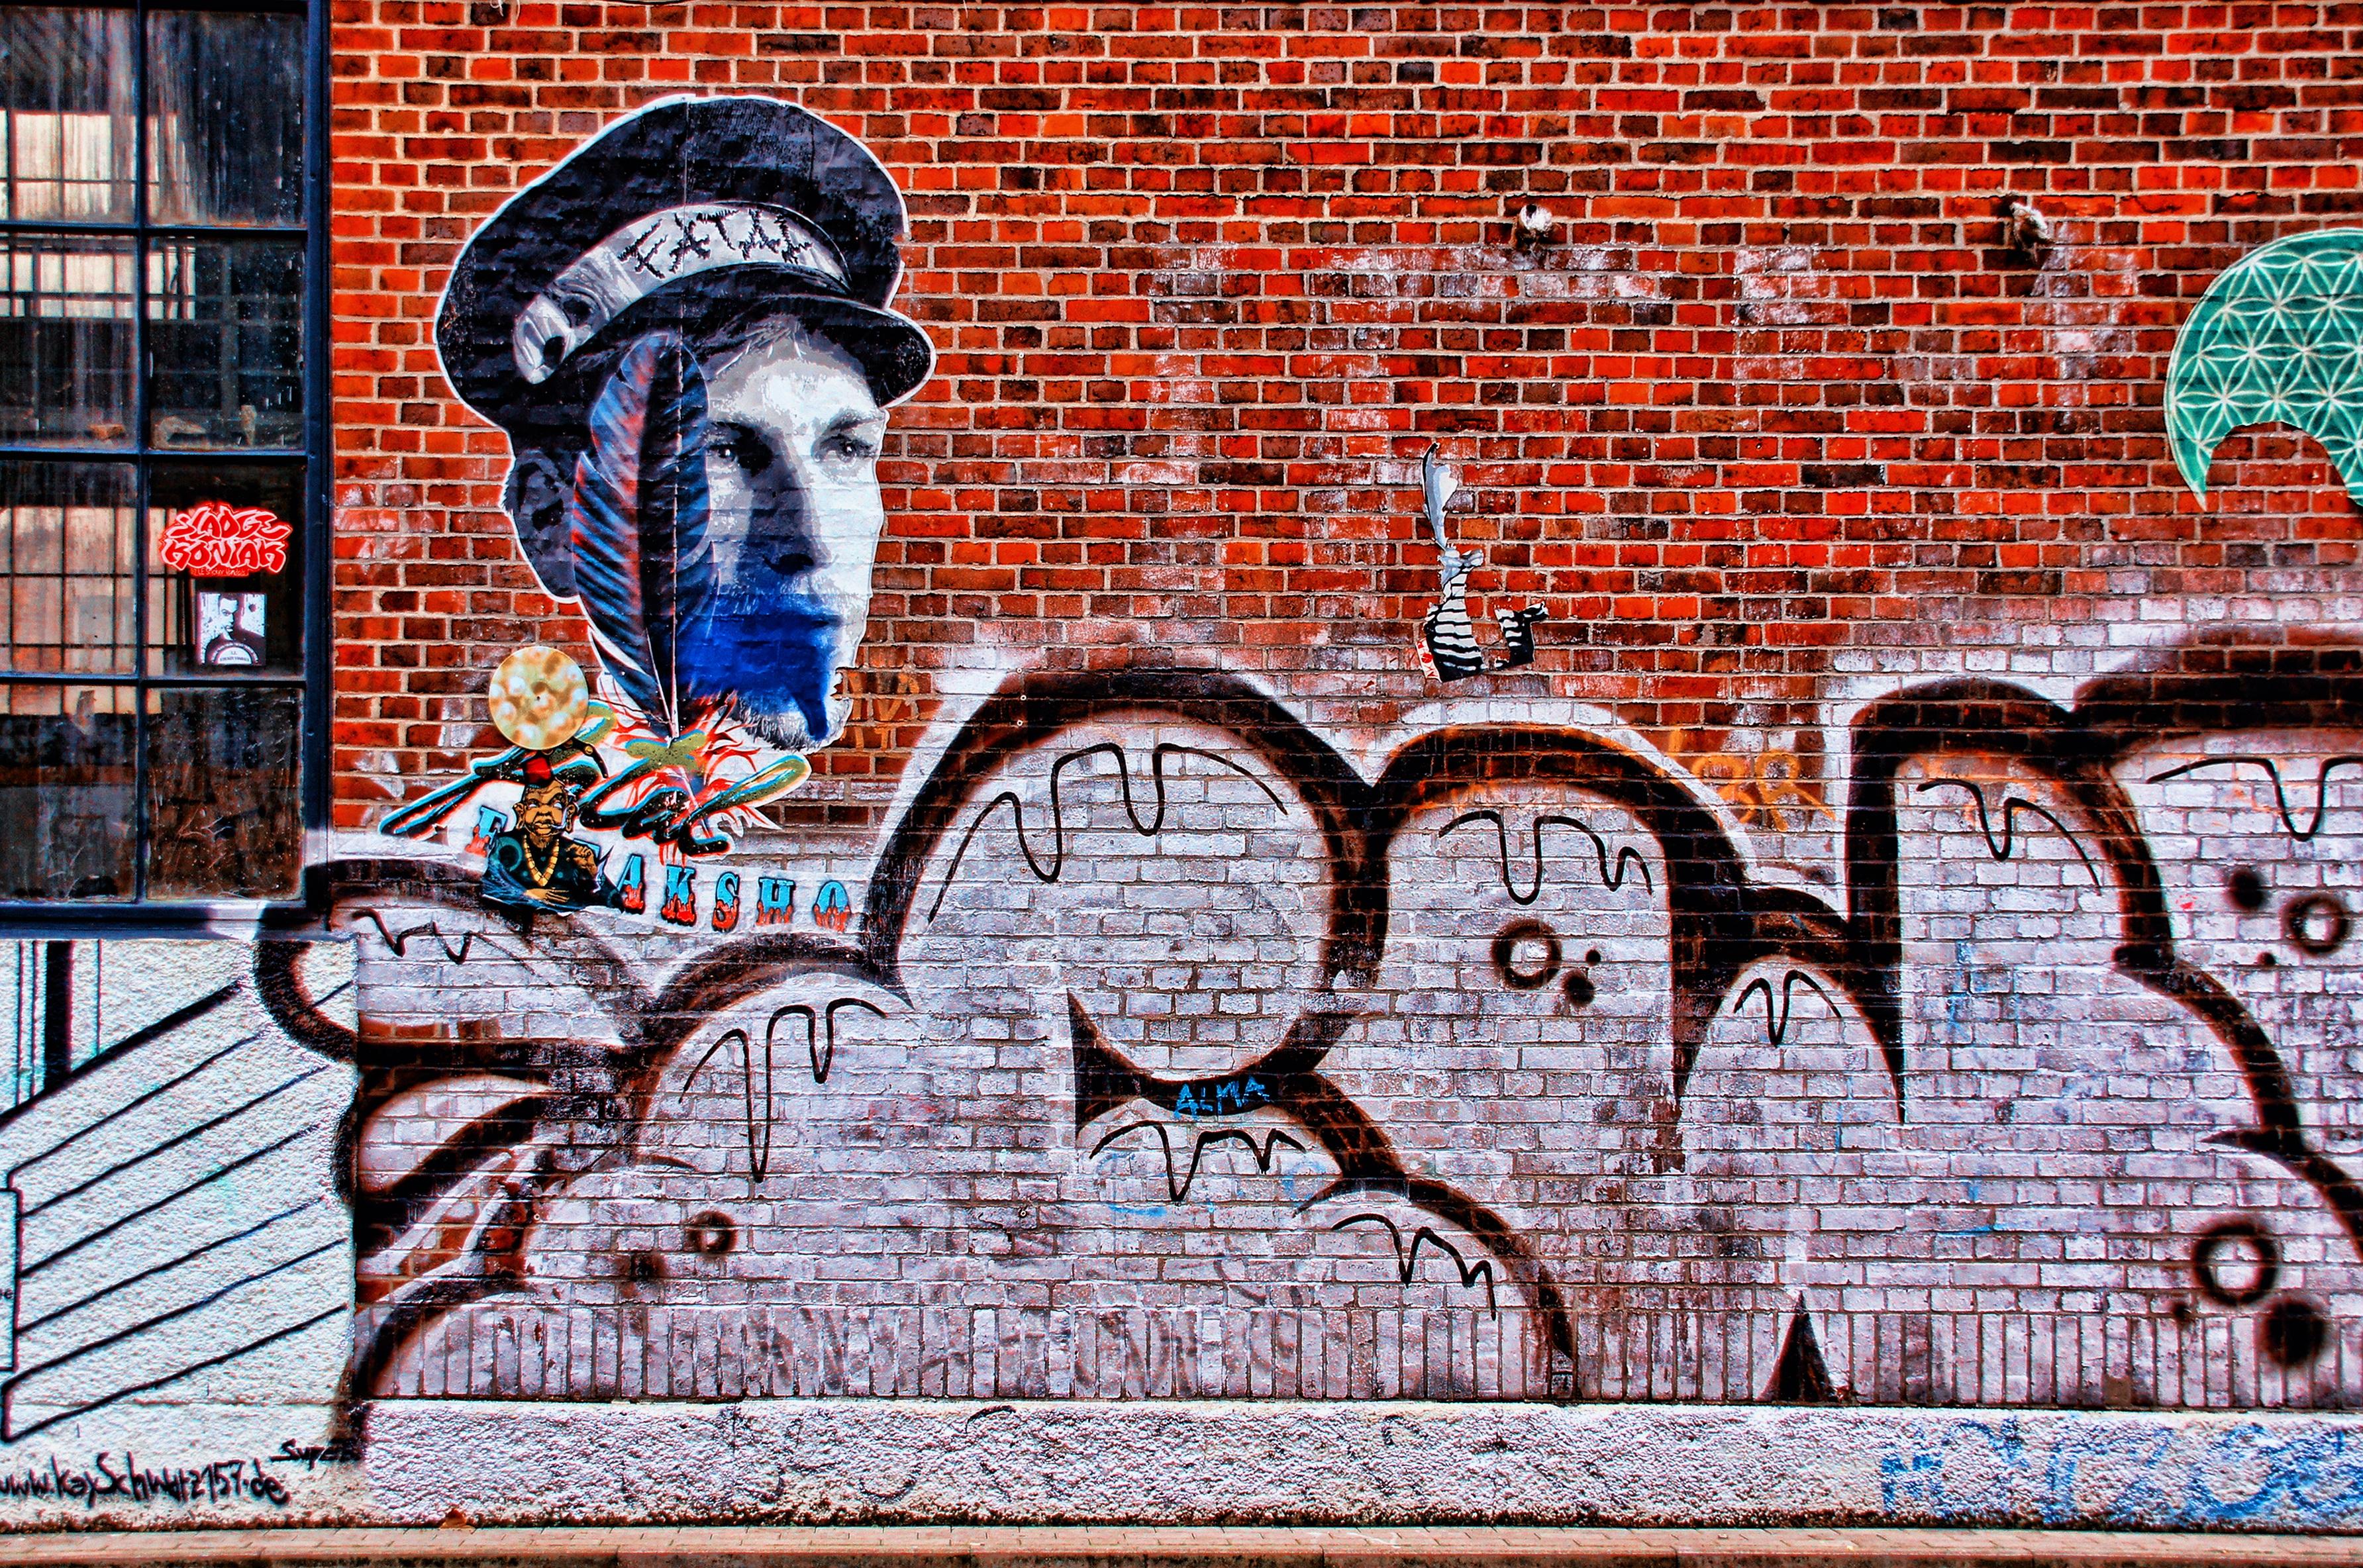 Grafitti wall painting - Road Street Wall Spray Factory Graffiti Painting Street Art Art Mural Leipzig Wall Painting Sprayer Hauswand